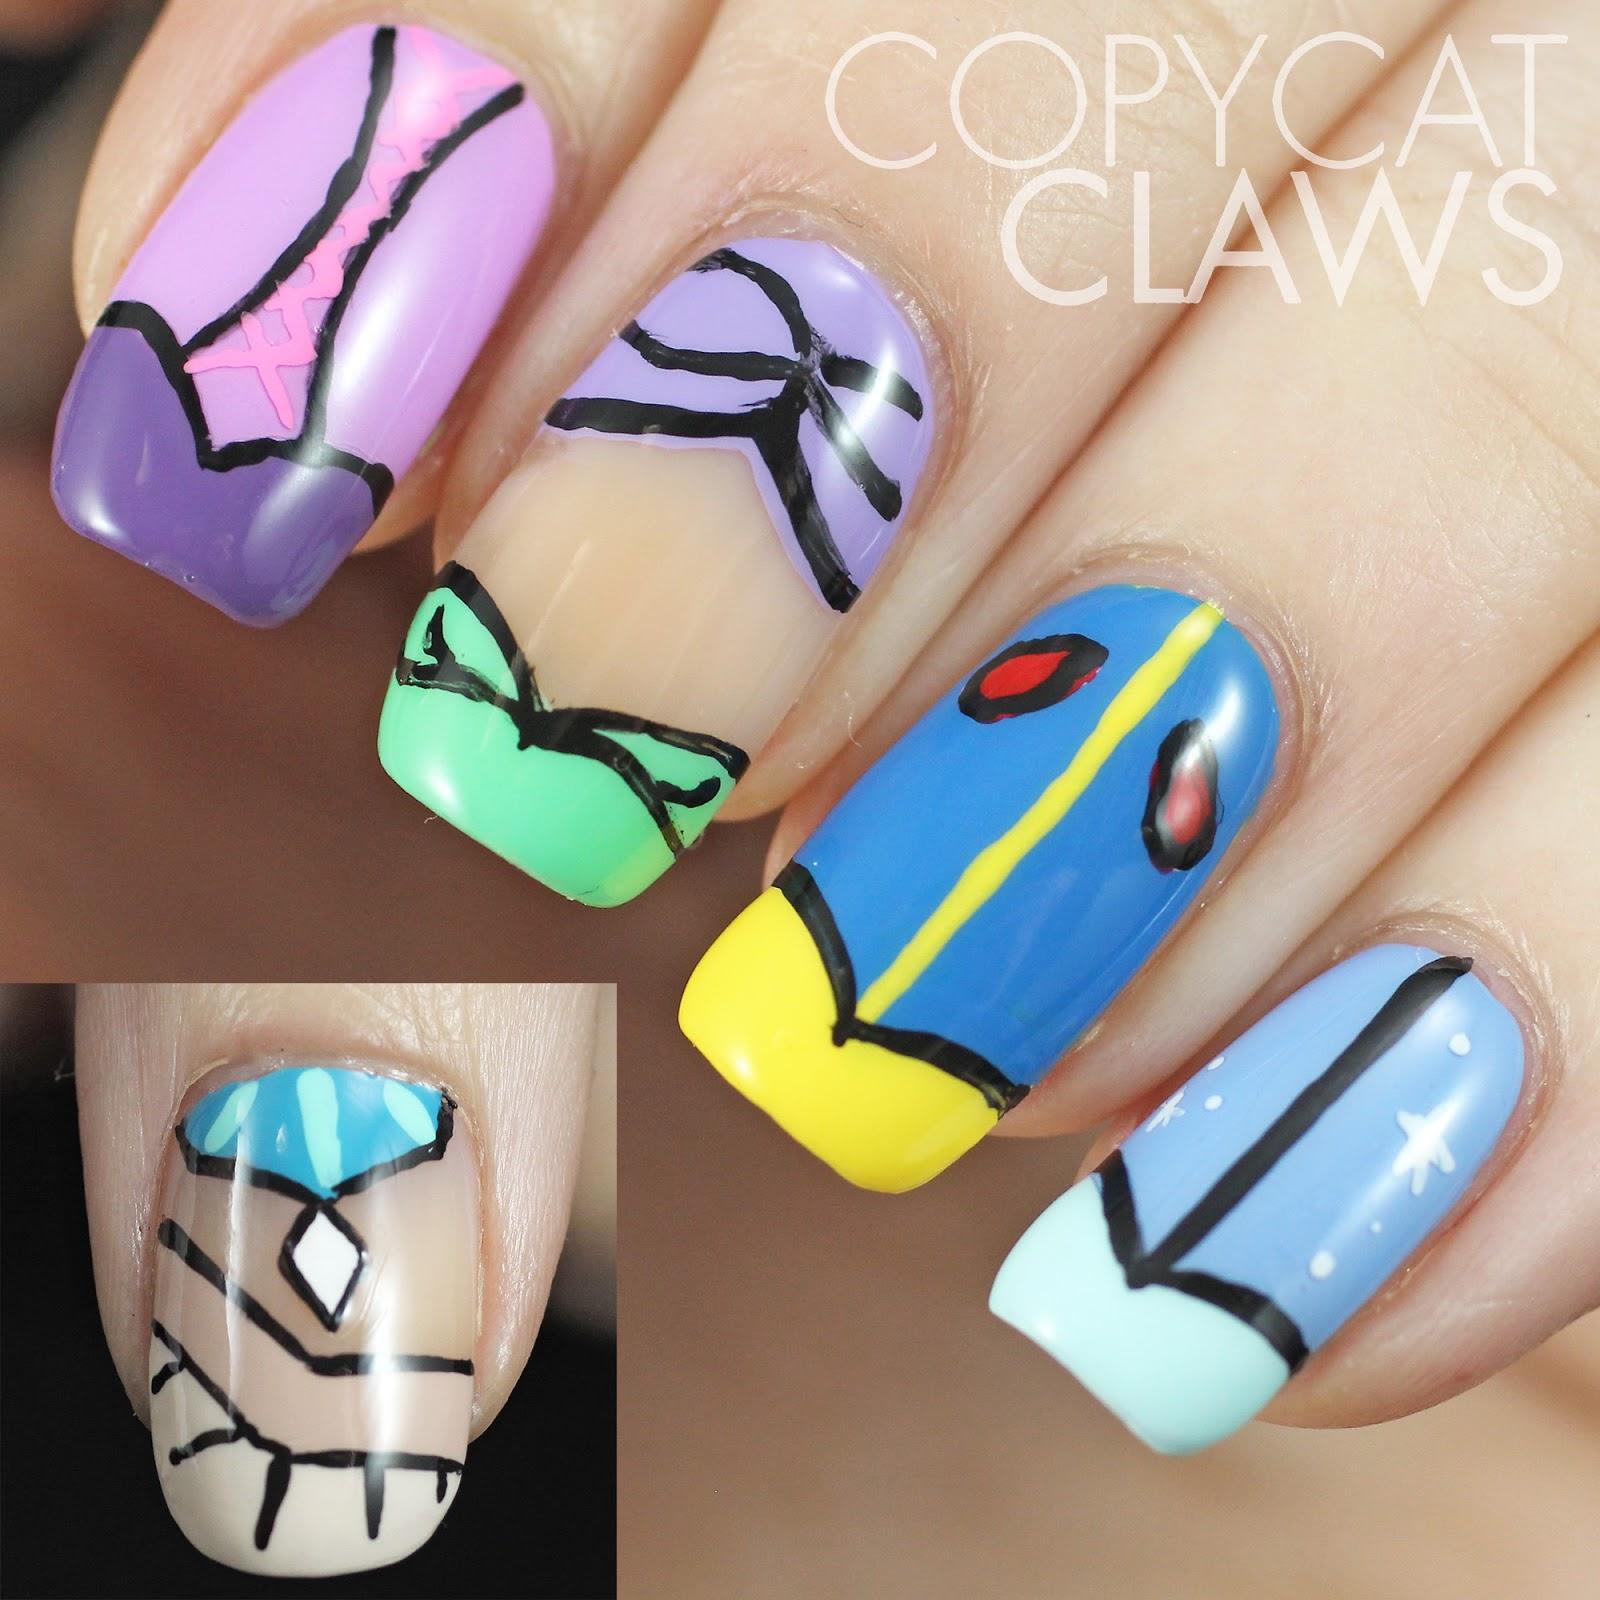 Disney Princess Nails: Copycat Claws: The Digit-al Dozen Does Fairy Tales: Day 2